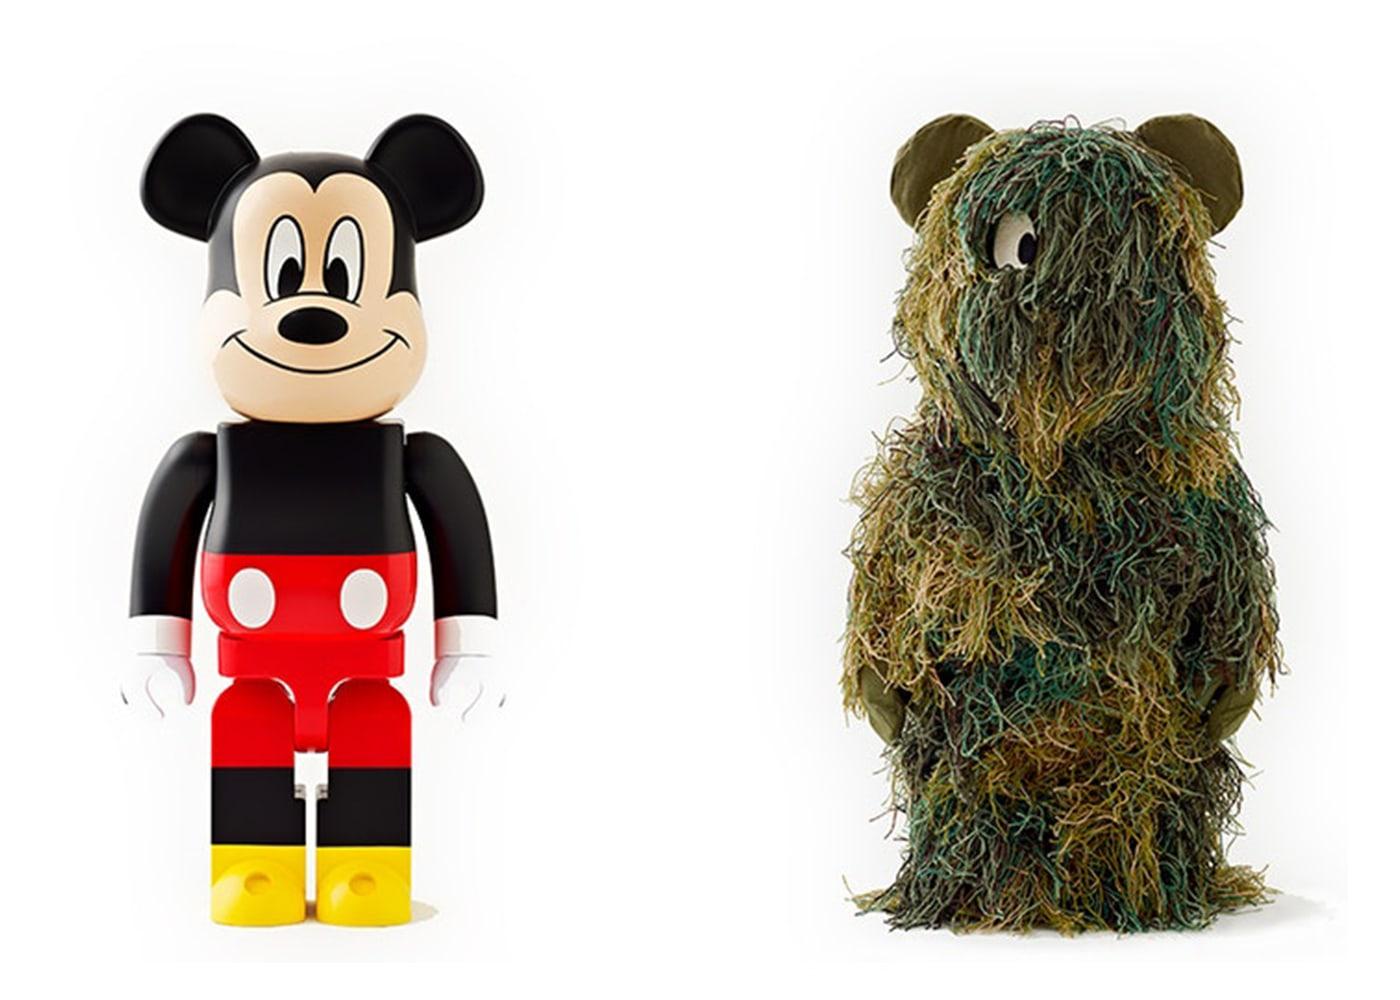 Readymade Mickey Mouse Bearbrick